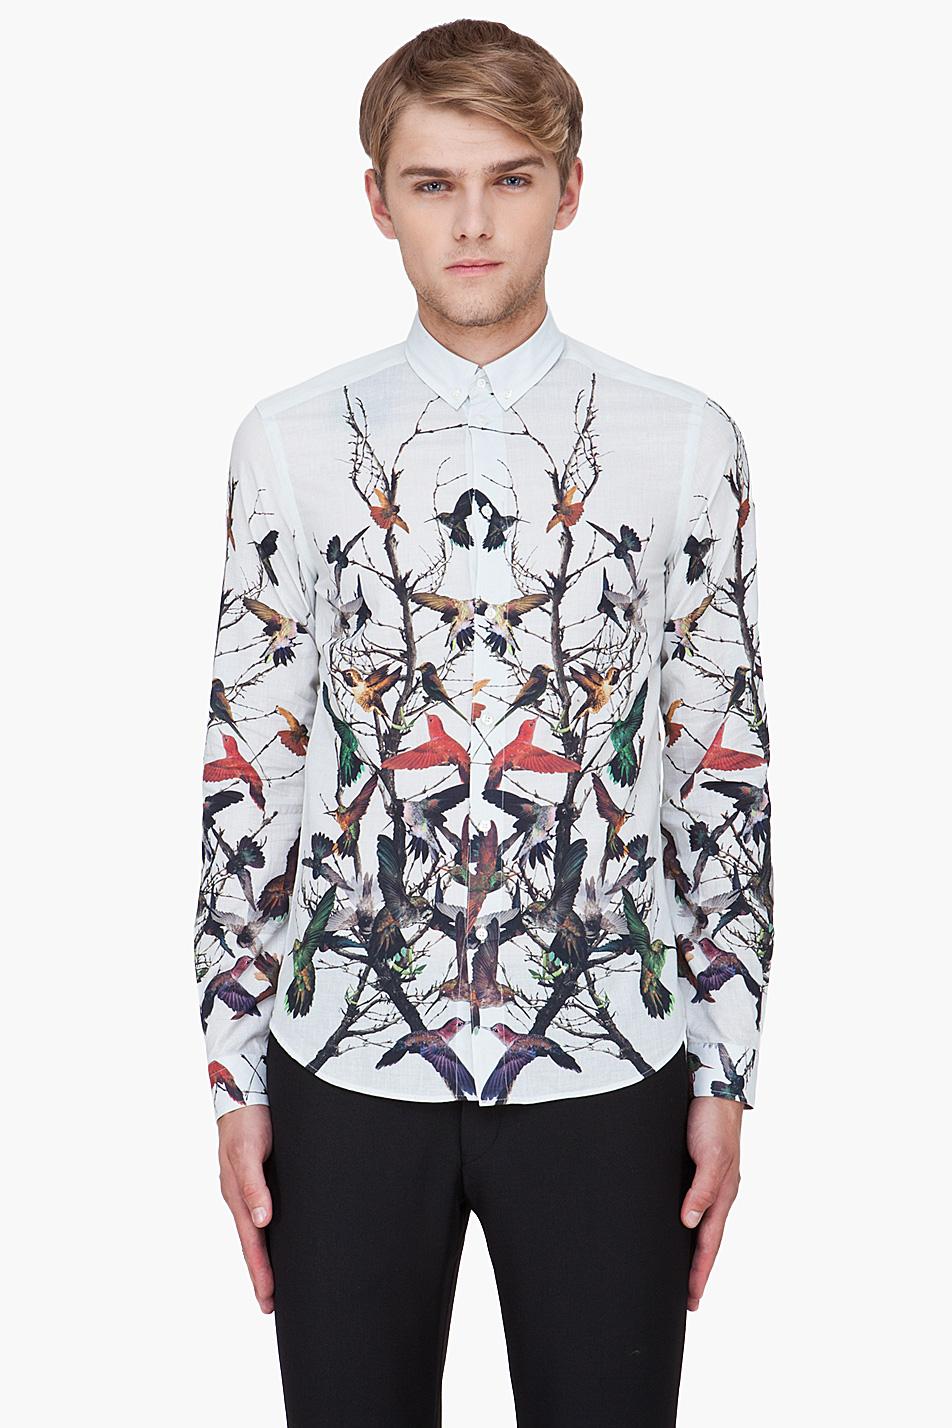 Mcq by alexander mcqueen ivory hummingbird print shirt in for Alexander mcqueen shirt men